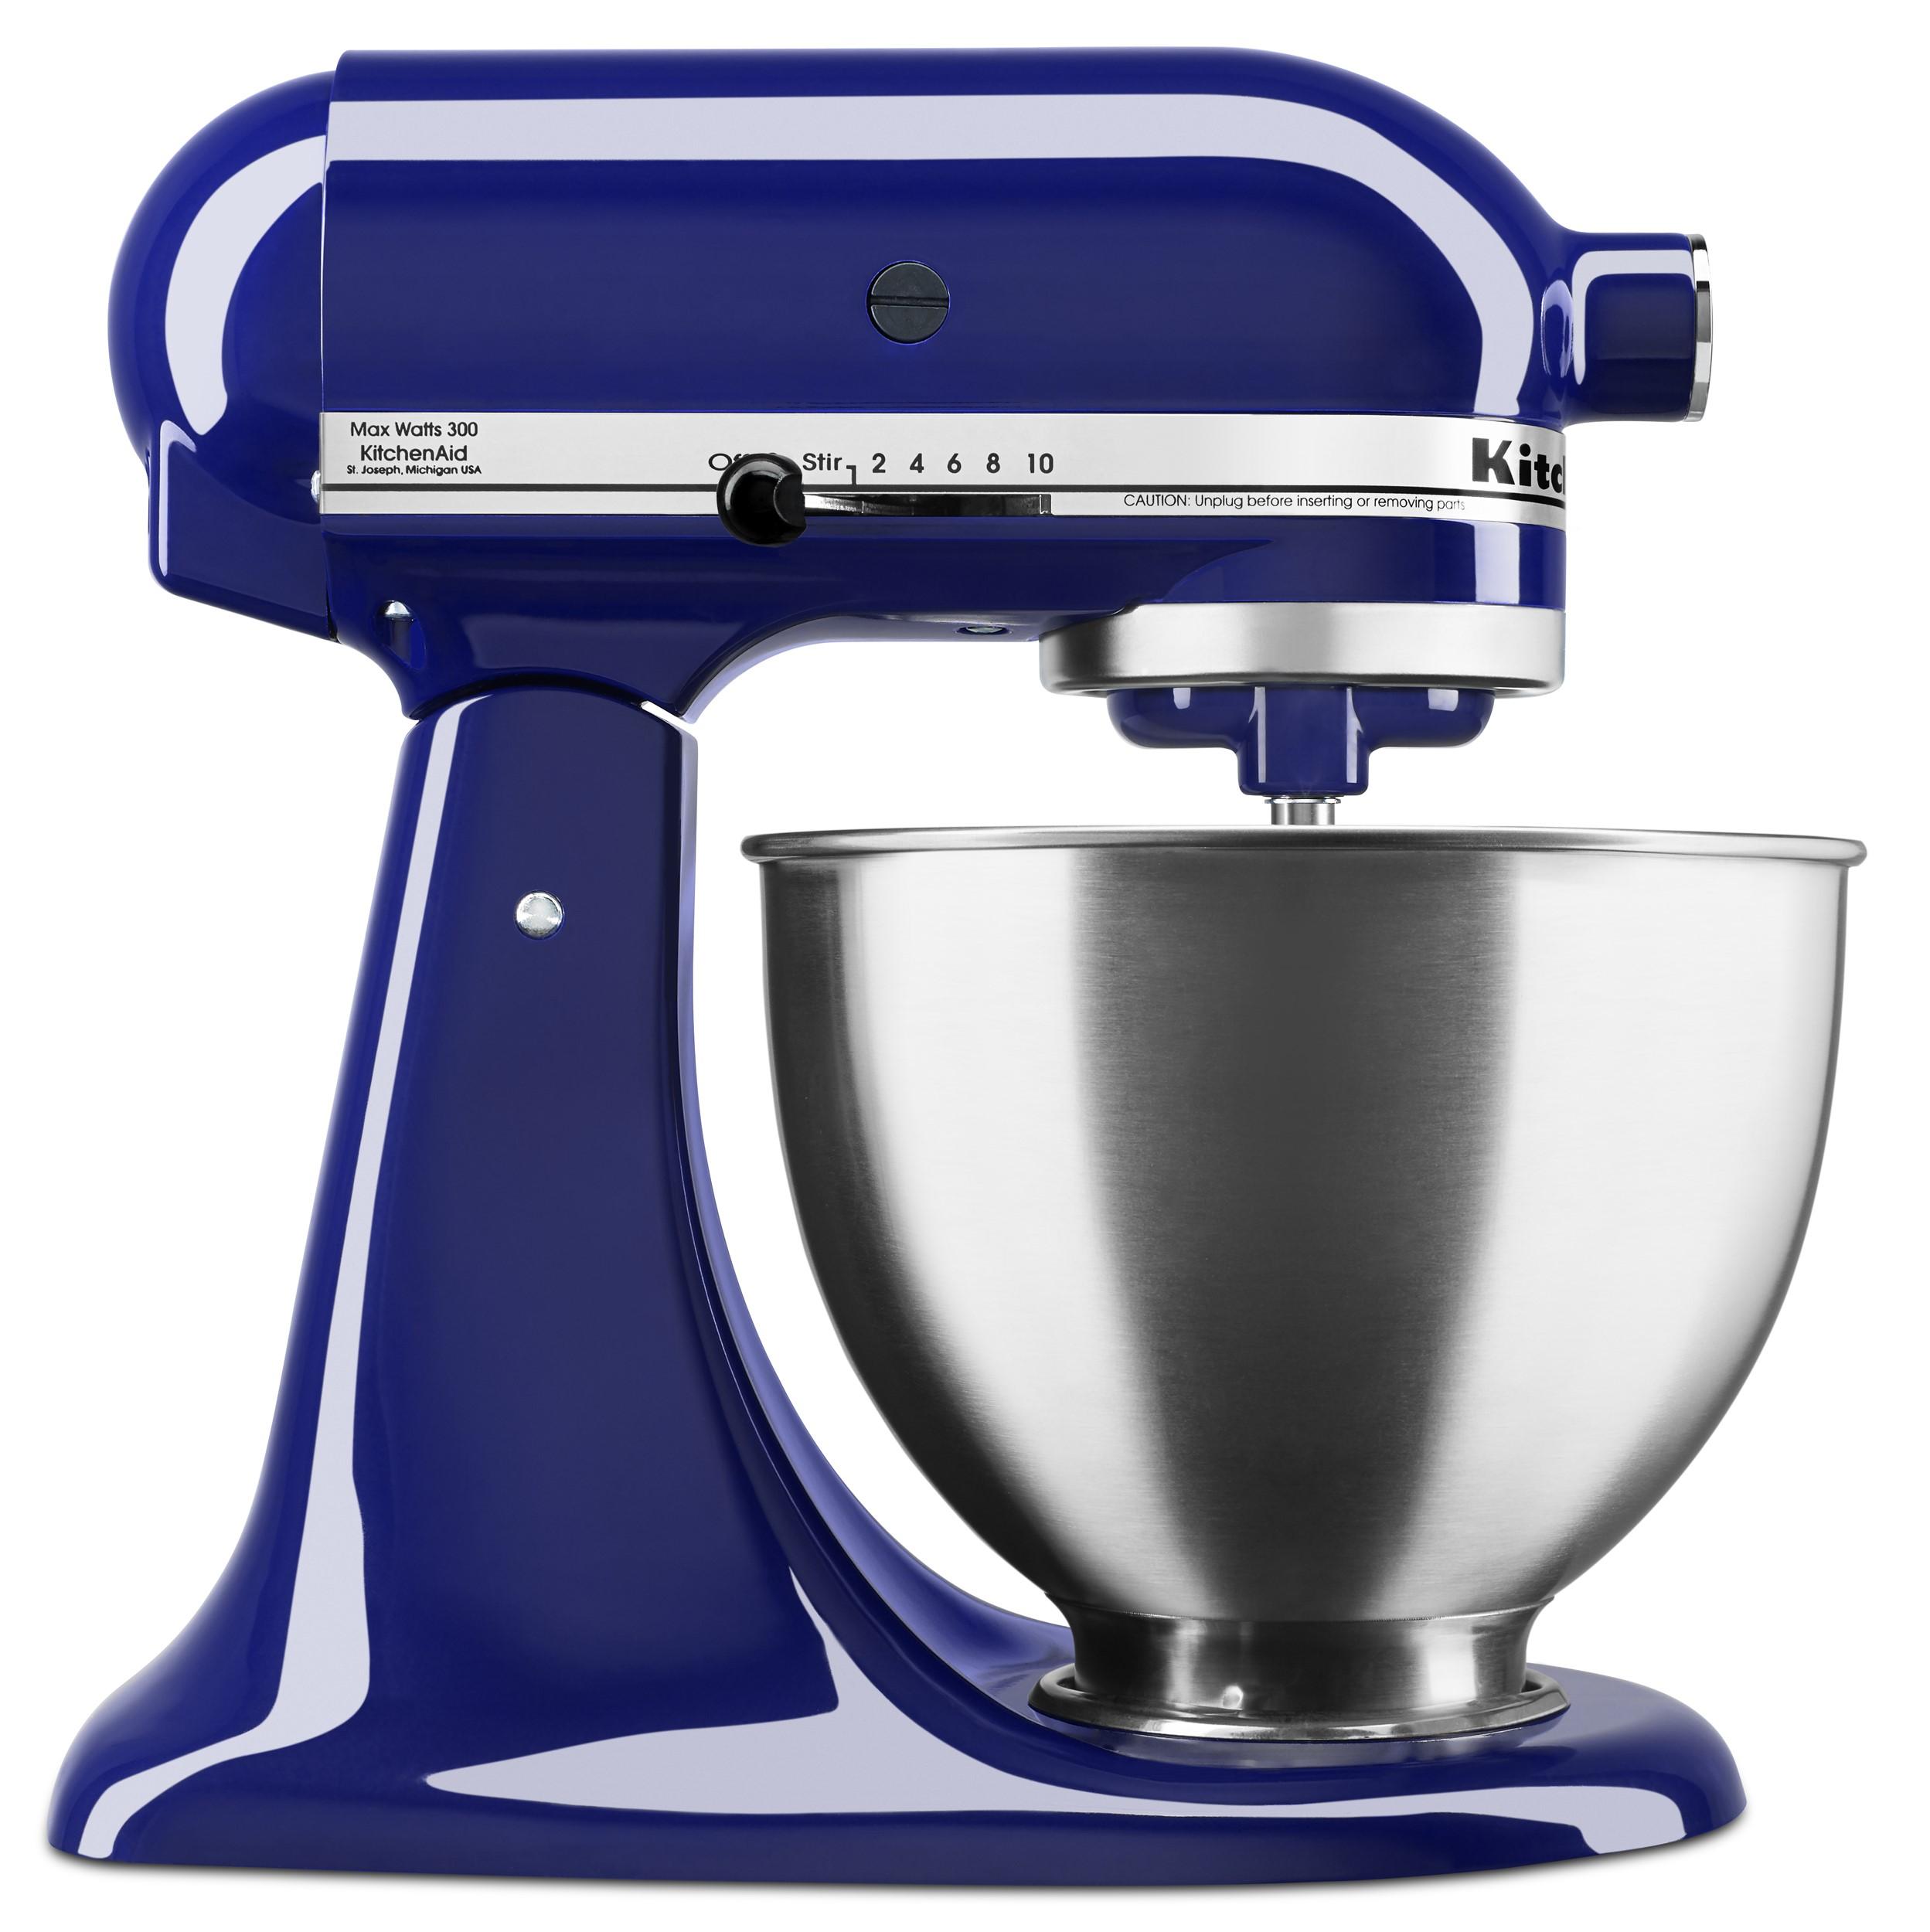 KitchenAid Deluxe 4.5 Quart Tilt-Head Cobalt Blue Stand Mixer (KSM88BU) YMMV Clearance @ Walmart B&M $99